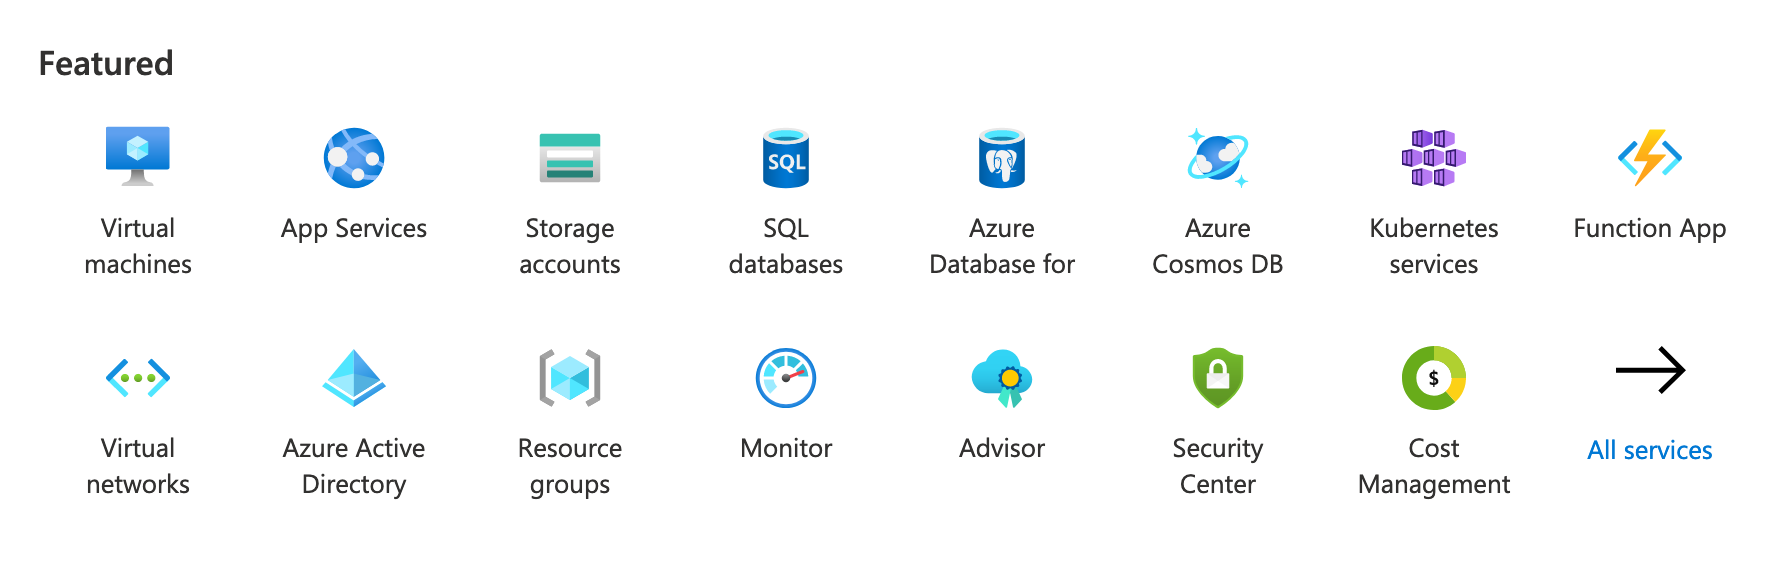 Popular Azure resources